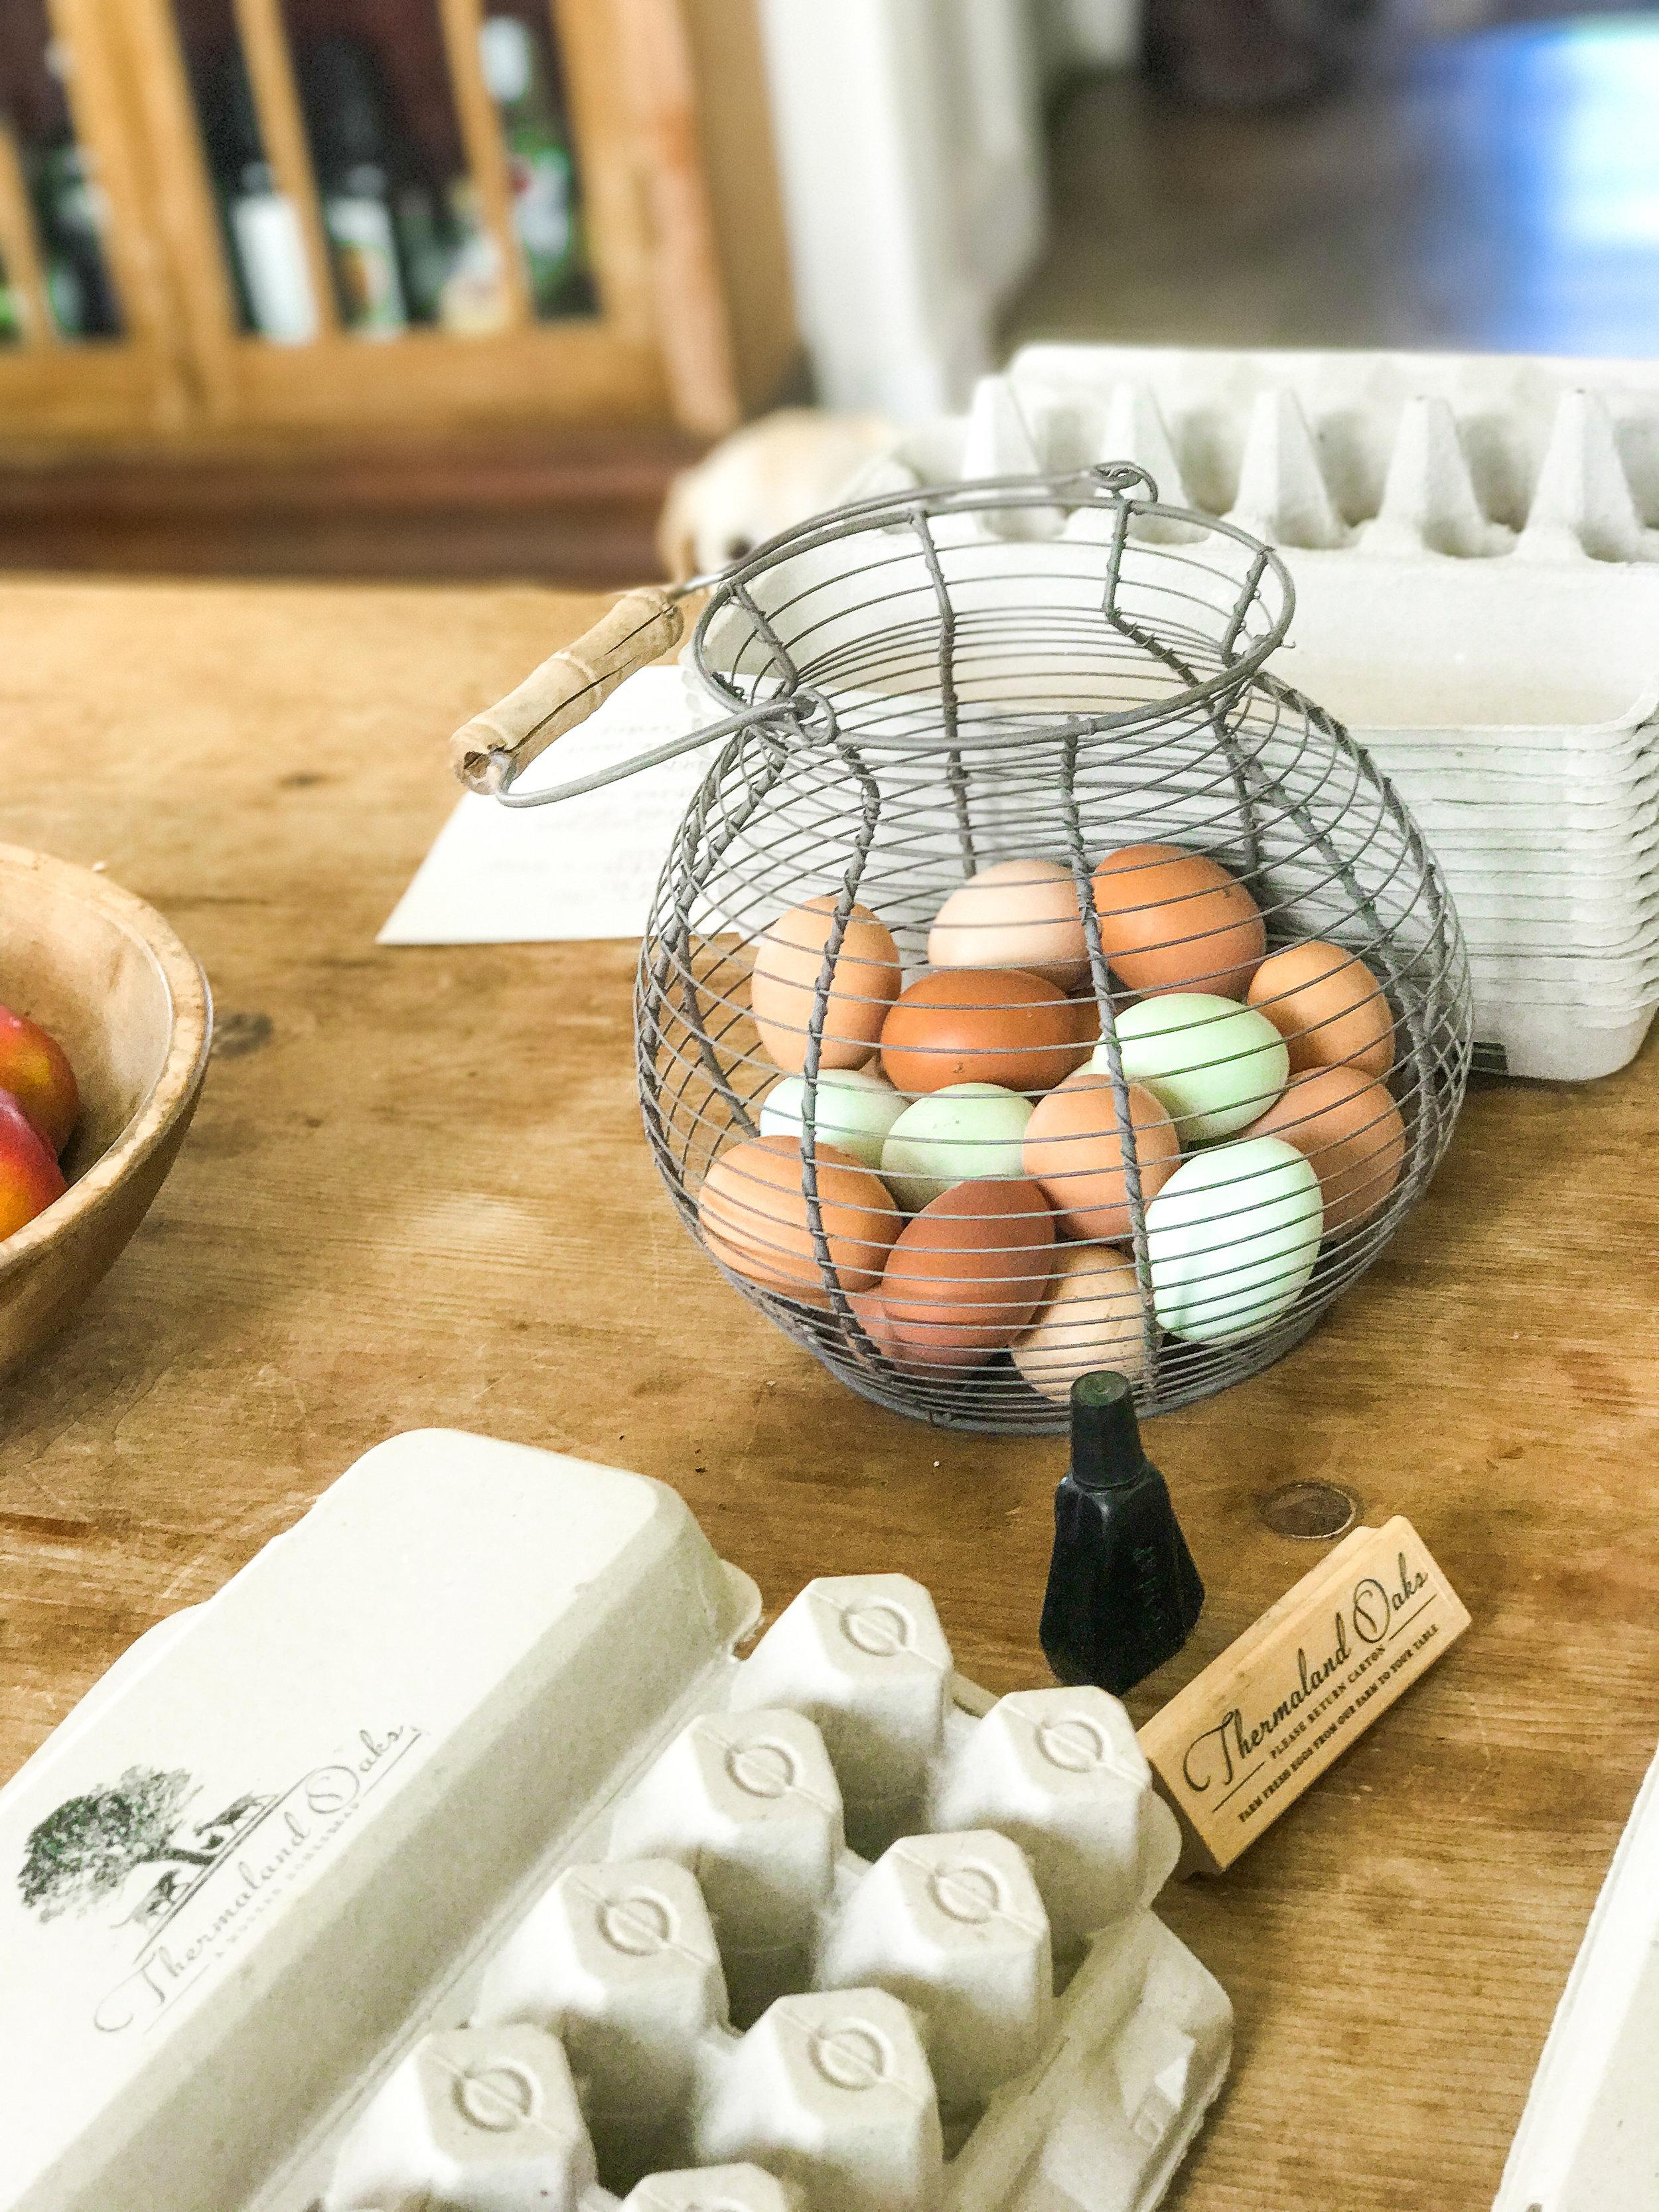 Rainbow Eggs, #rainboweggs, #eggs, #eggcolors, #farmfresheggs, #farmeggs, #rainbowfood, #blueeggs, #browneggs, #greeneggs, #oliveeggers, #spottedeggs, #nutrition